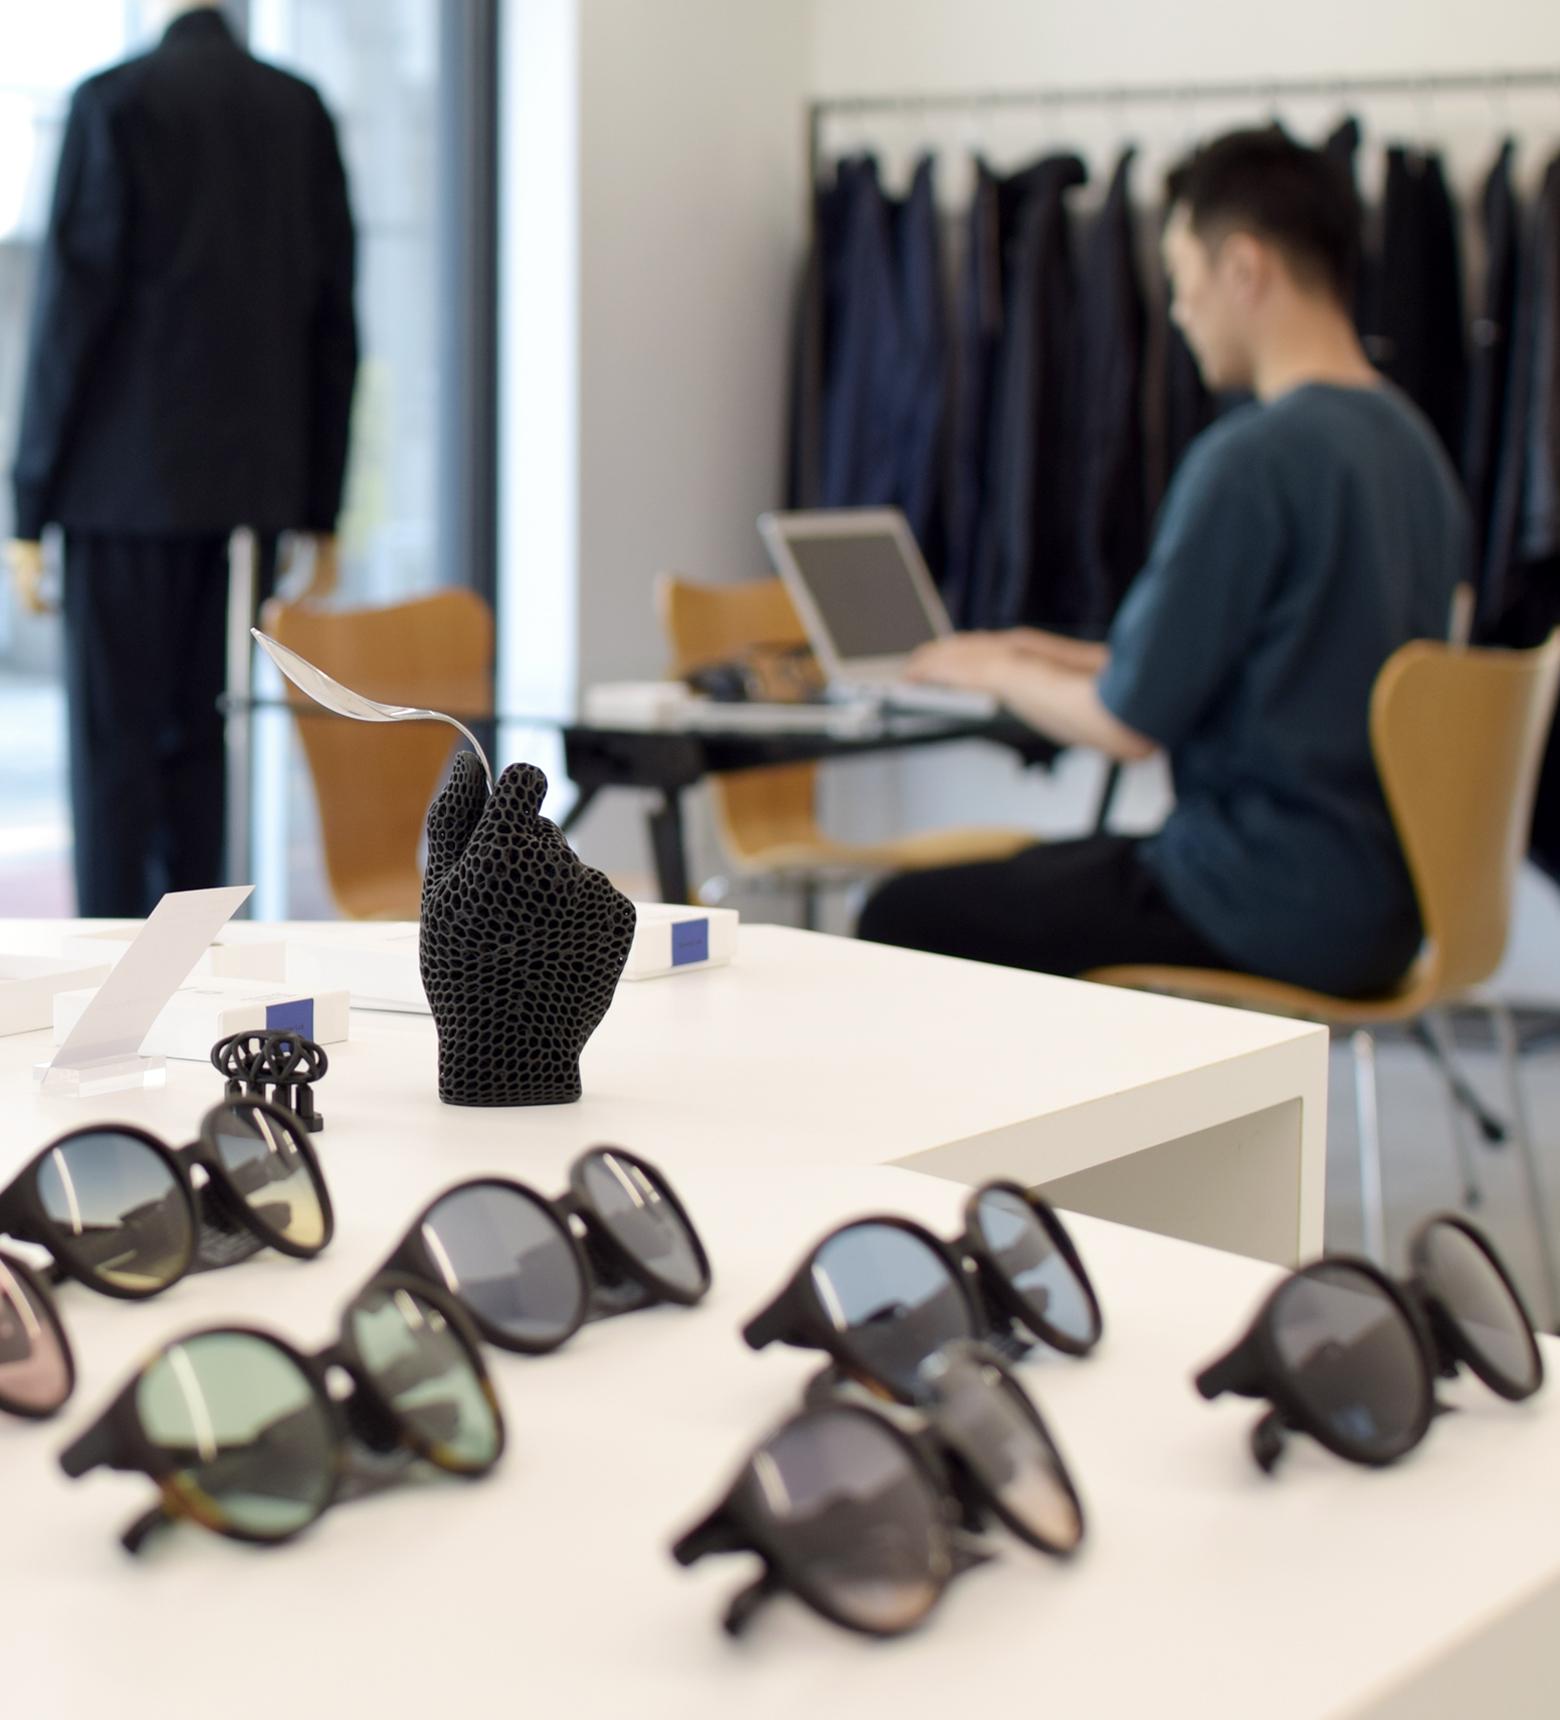 J Eyewear Lab × MINOTAUR INST.「ファーストペンギンとして先進的な取り組みを」